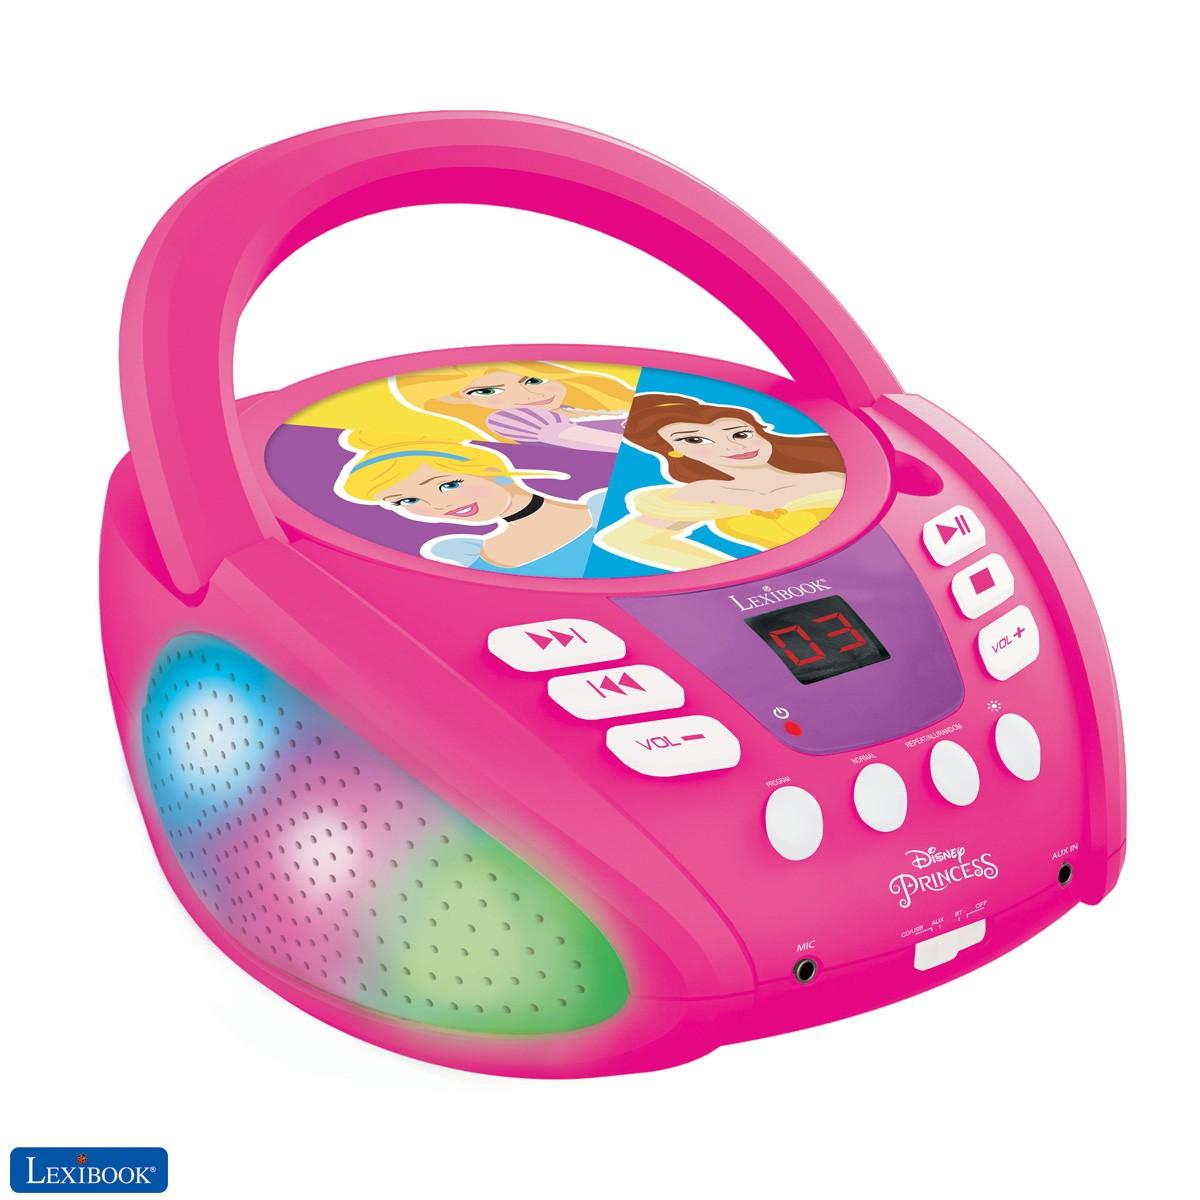 Disney Princess  - Bluetooth CD player for kids